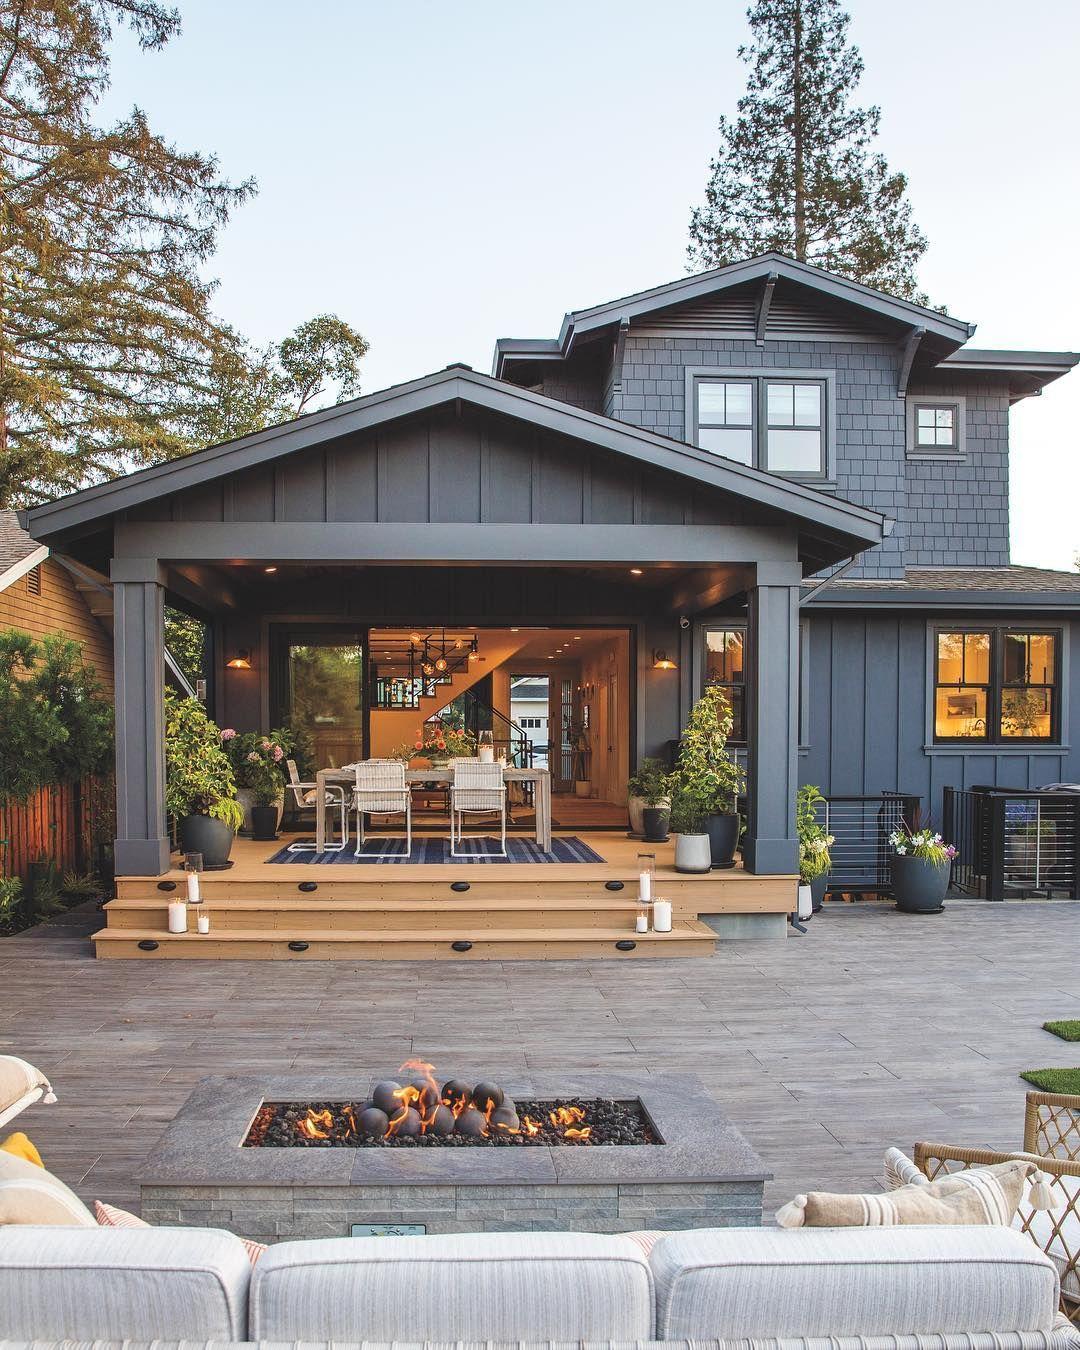 Sunset Magazine On Instagram Our Los Gatos Idea House Makes One Notable Departure From Traditional Craftsman Homes It Ev Zemin Planlari Ev Mimarisi Ev Plani